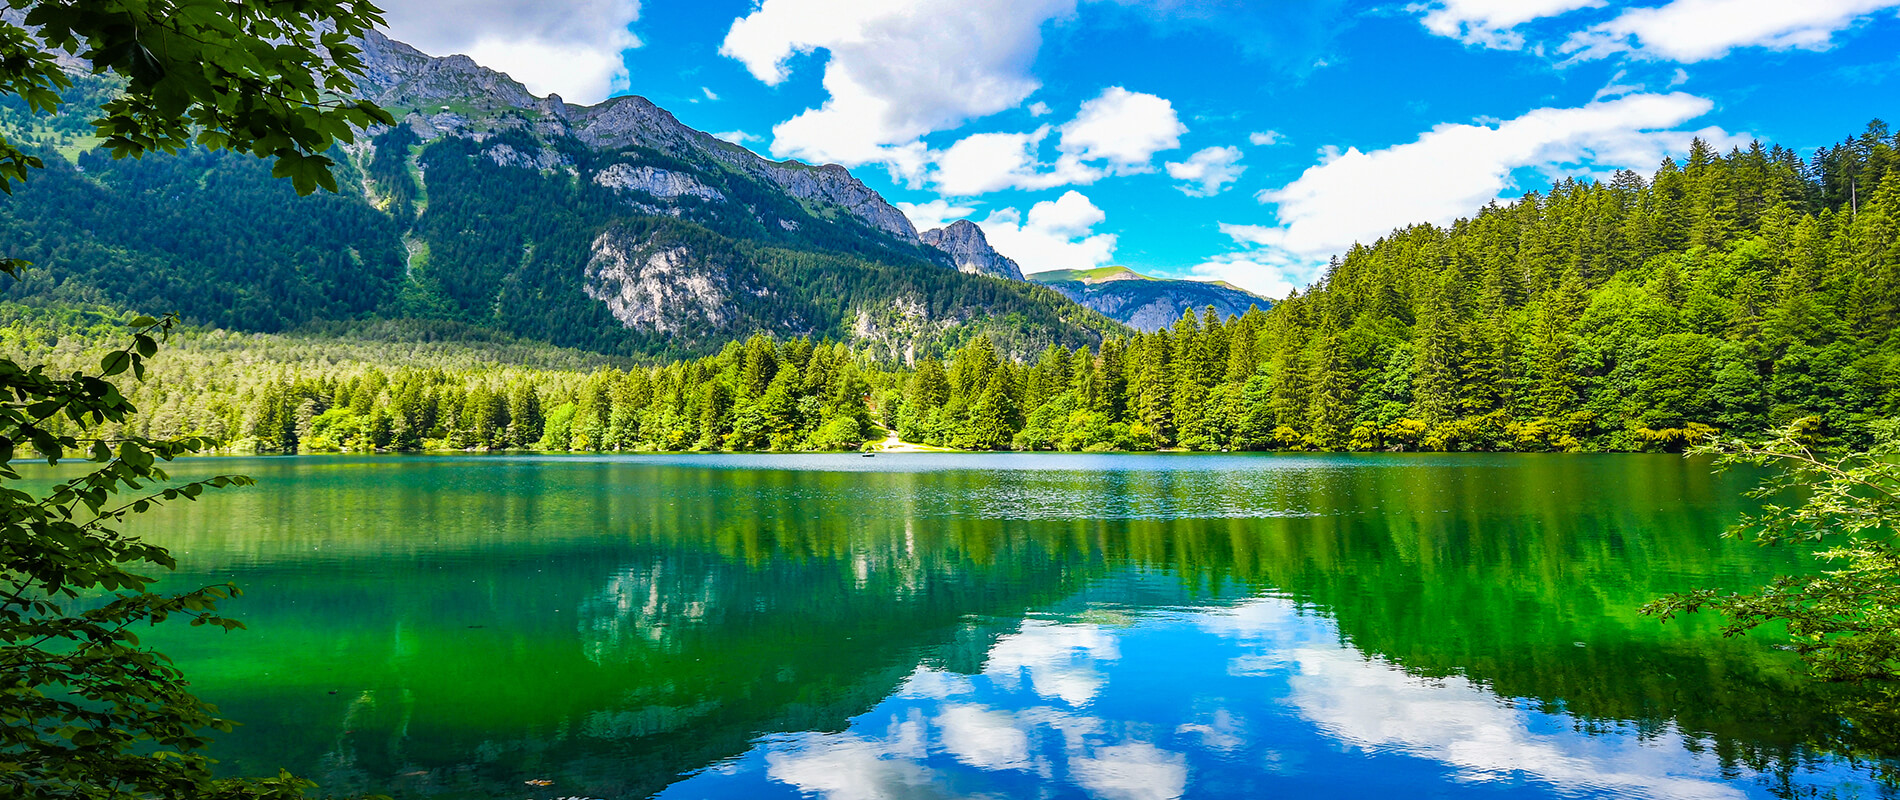 Lake Tovel, a Naturalistic Jewel of Trentino